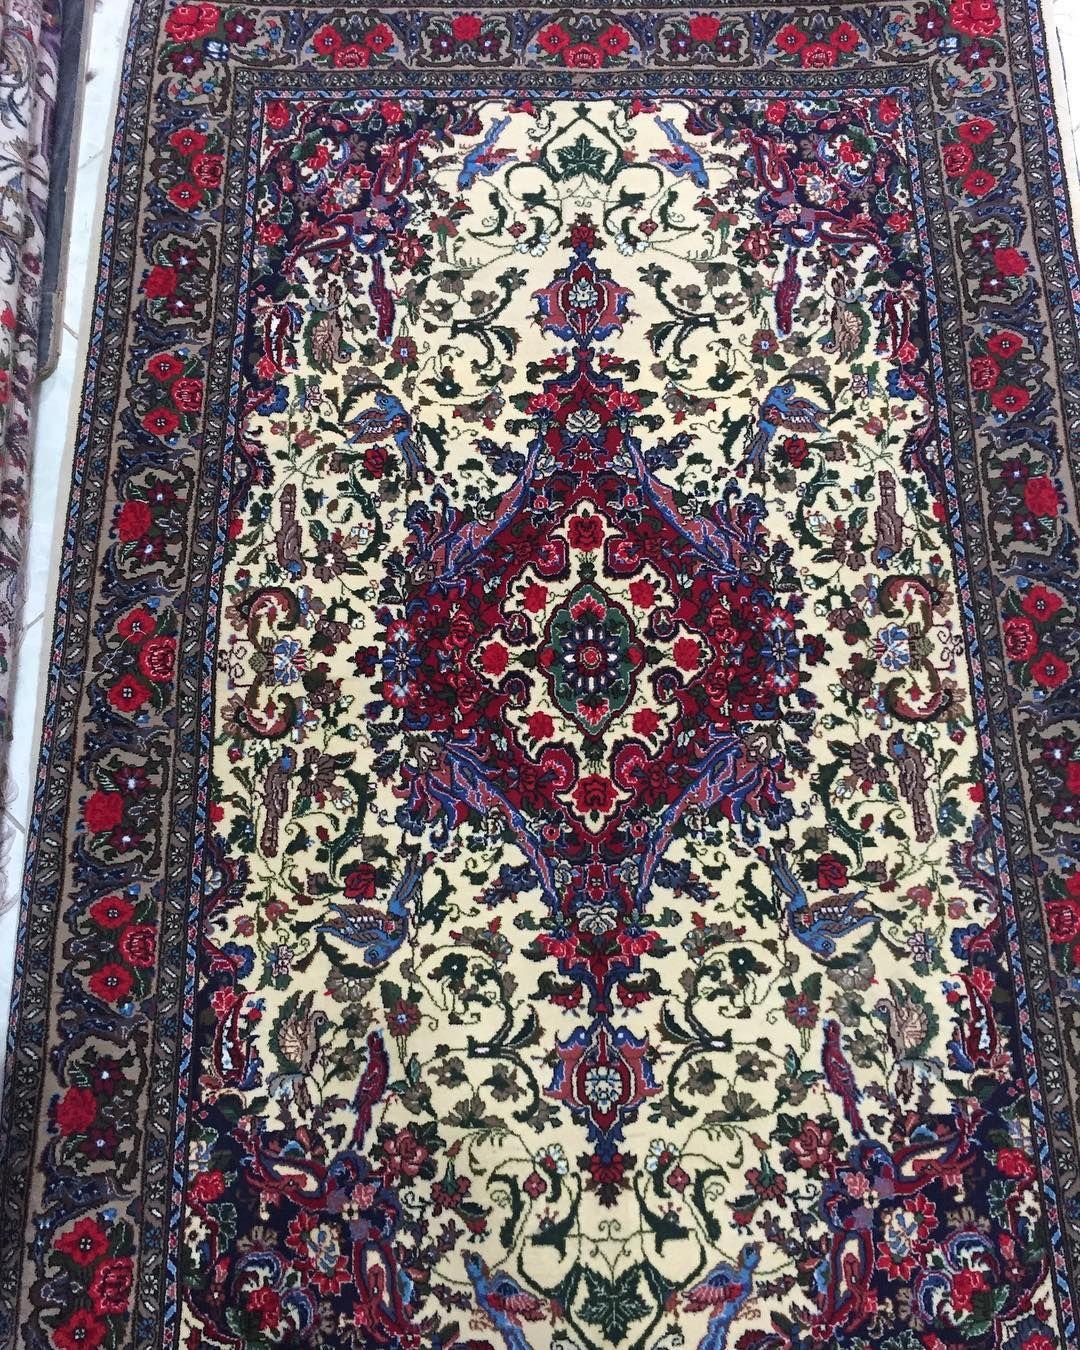 Silk Carpet World Address Silk Carpet World D 12 213 Rohini Sector 7 New Delhi Call Whatsapp 919355336661 Silkcarpetwor Carpet World Carpet Stores Carpet